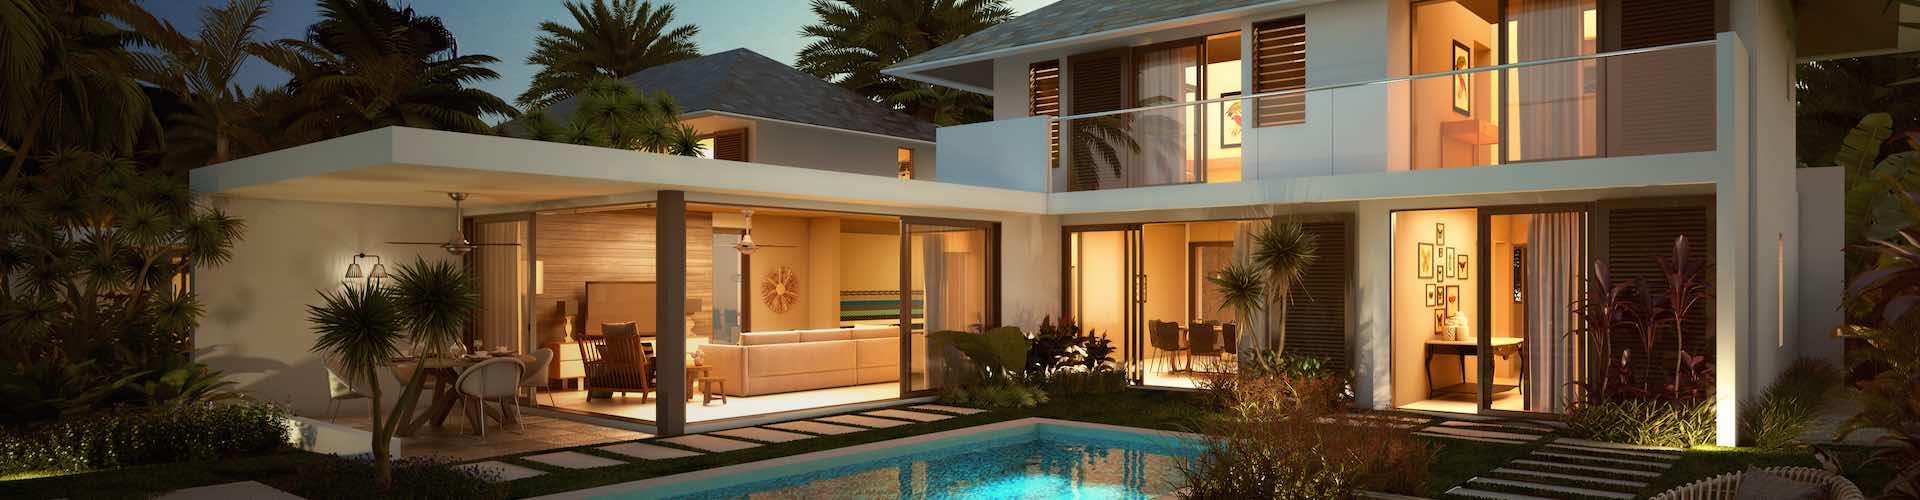 Immobilier De Prestige Ile De La Reunion